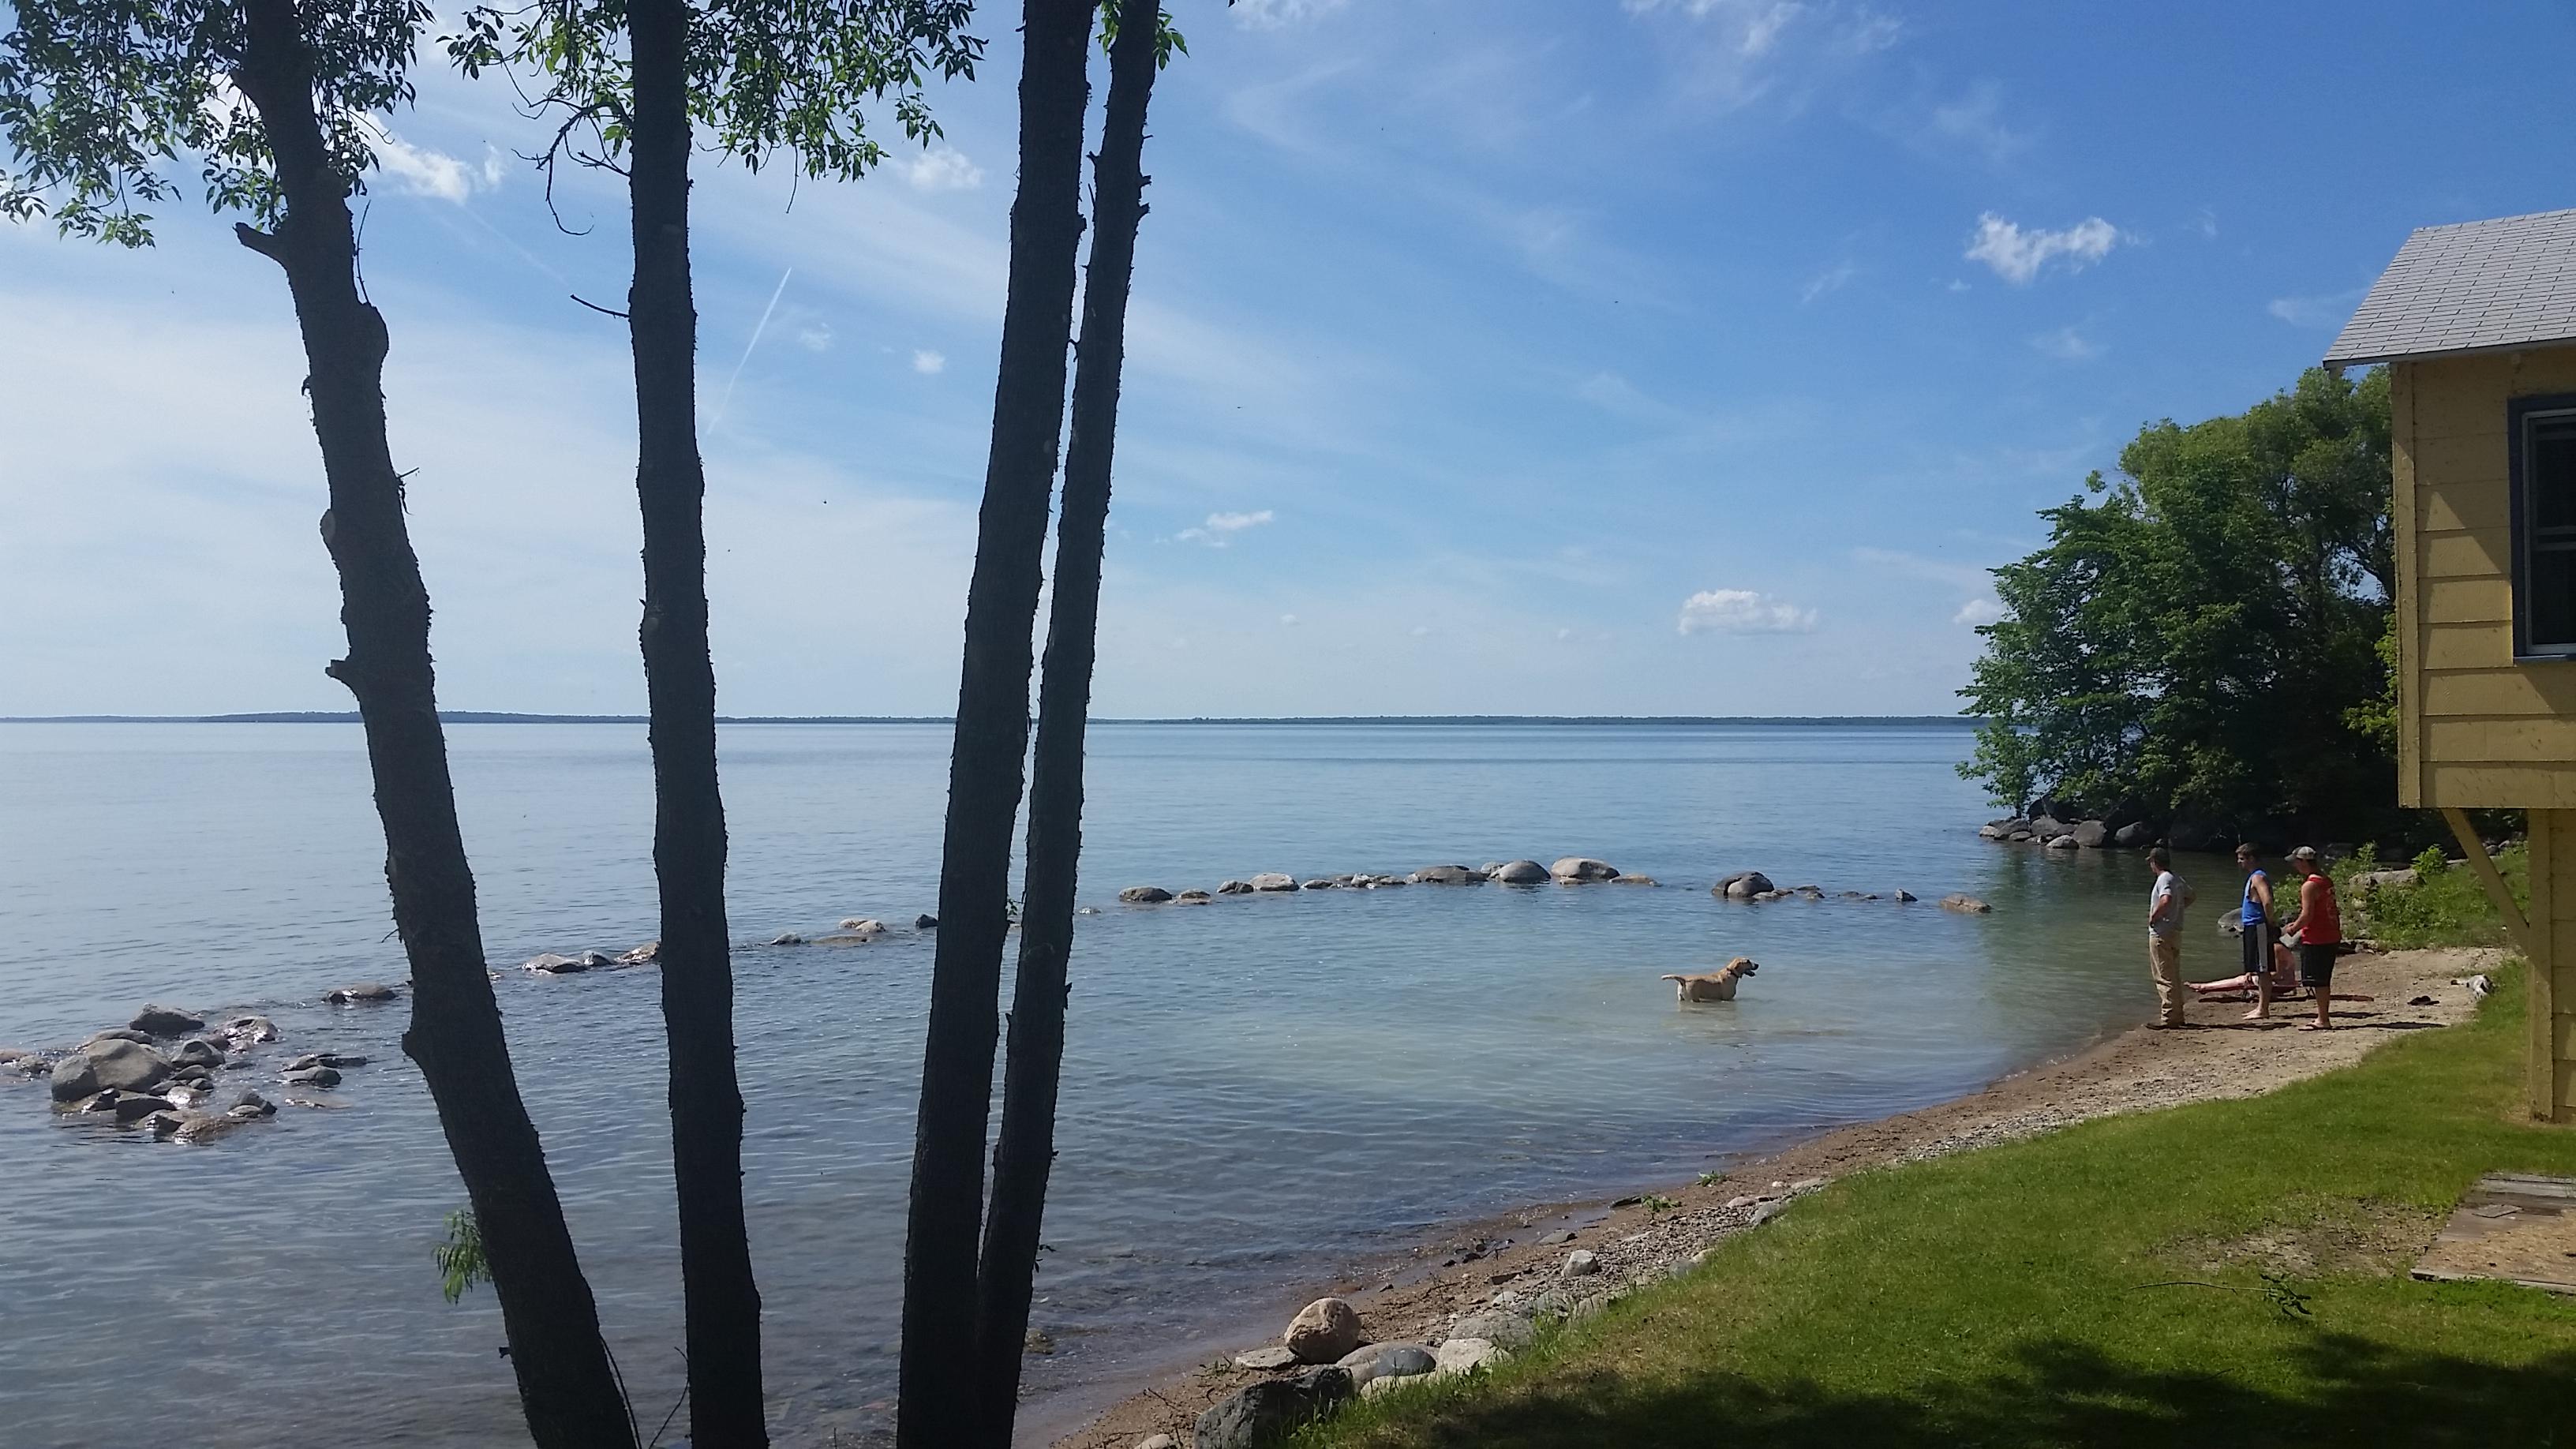 Rent To Own Rv >> Leech Lake Cabins, Fishing & Boating: Federal Dam, MN: Sugar Point Resort